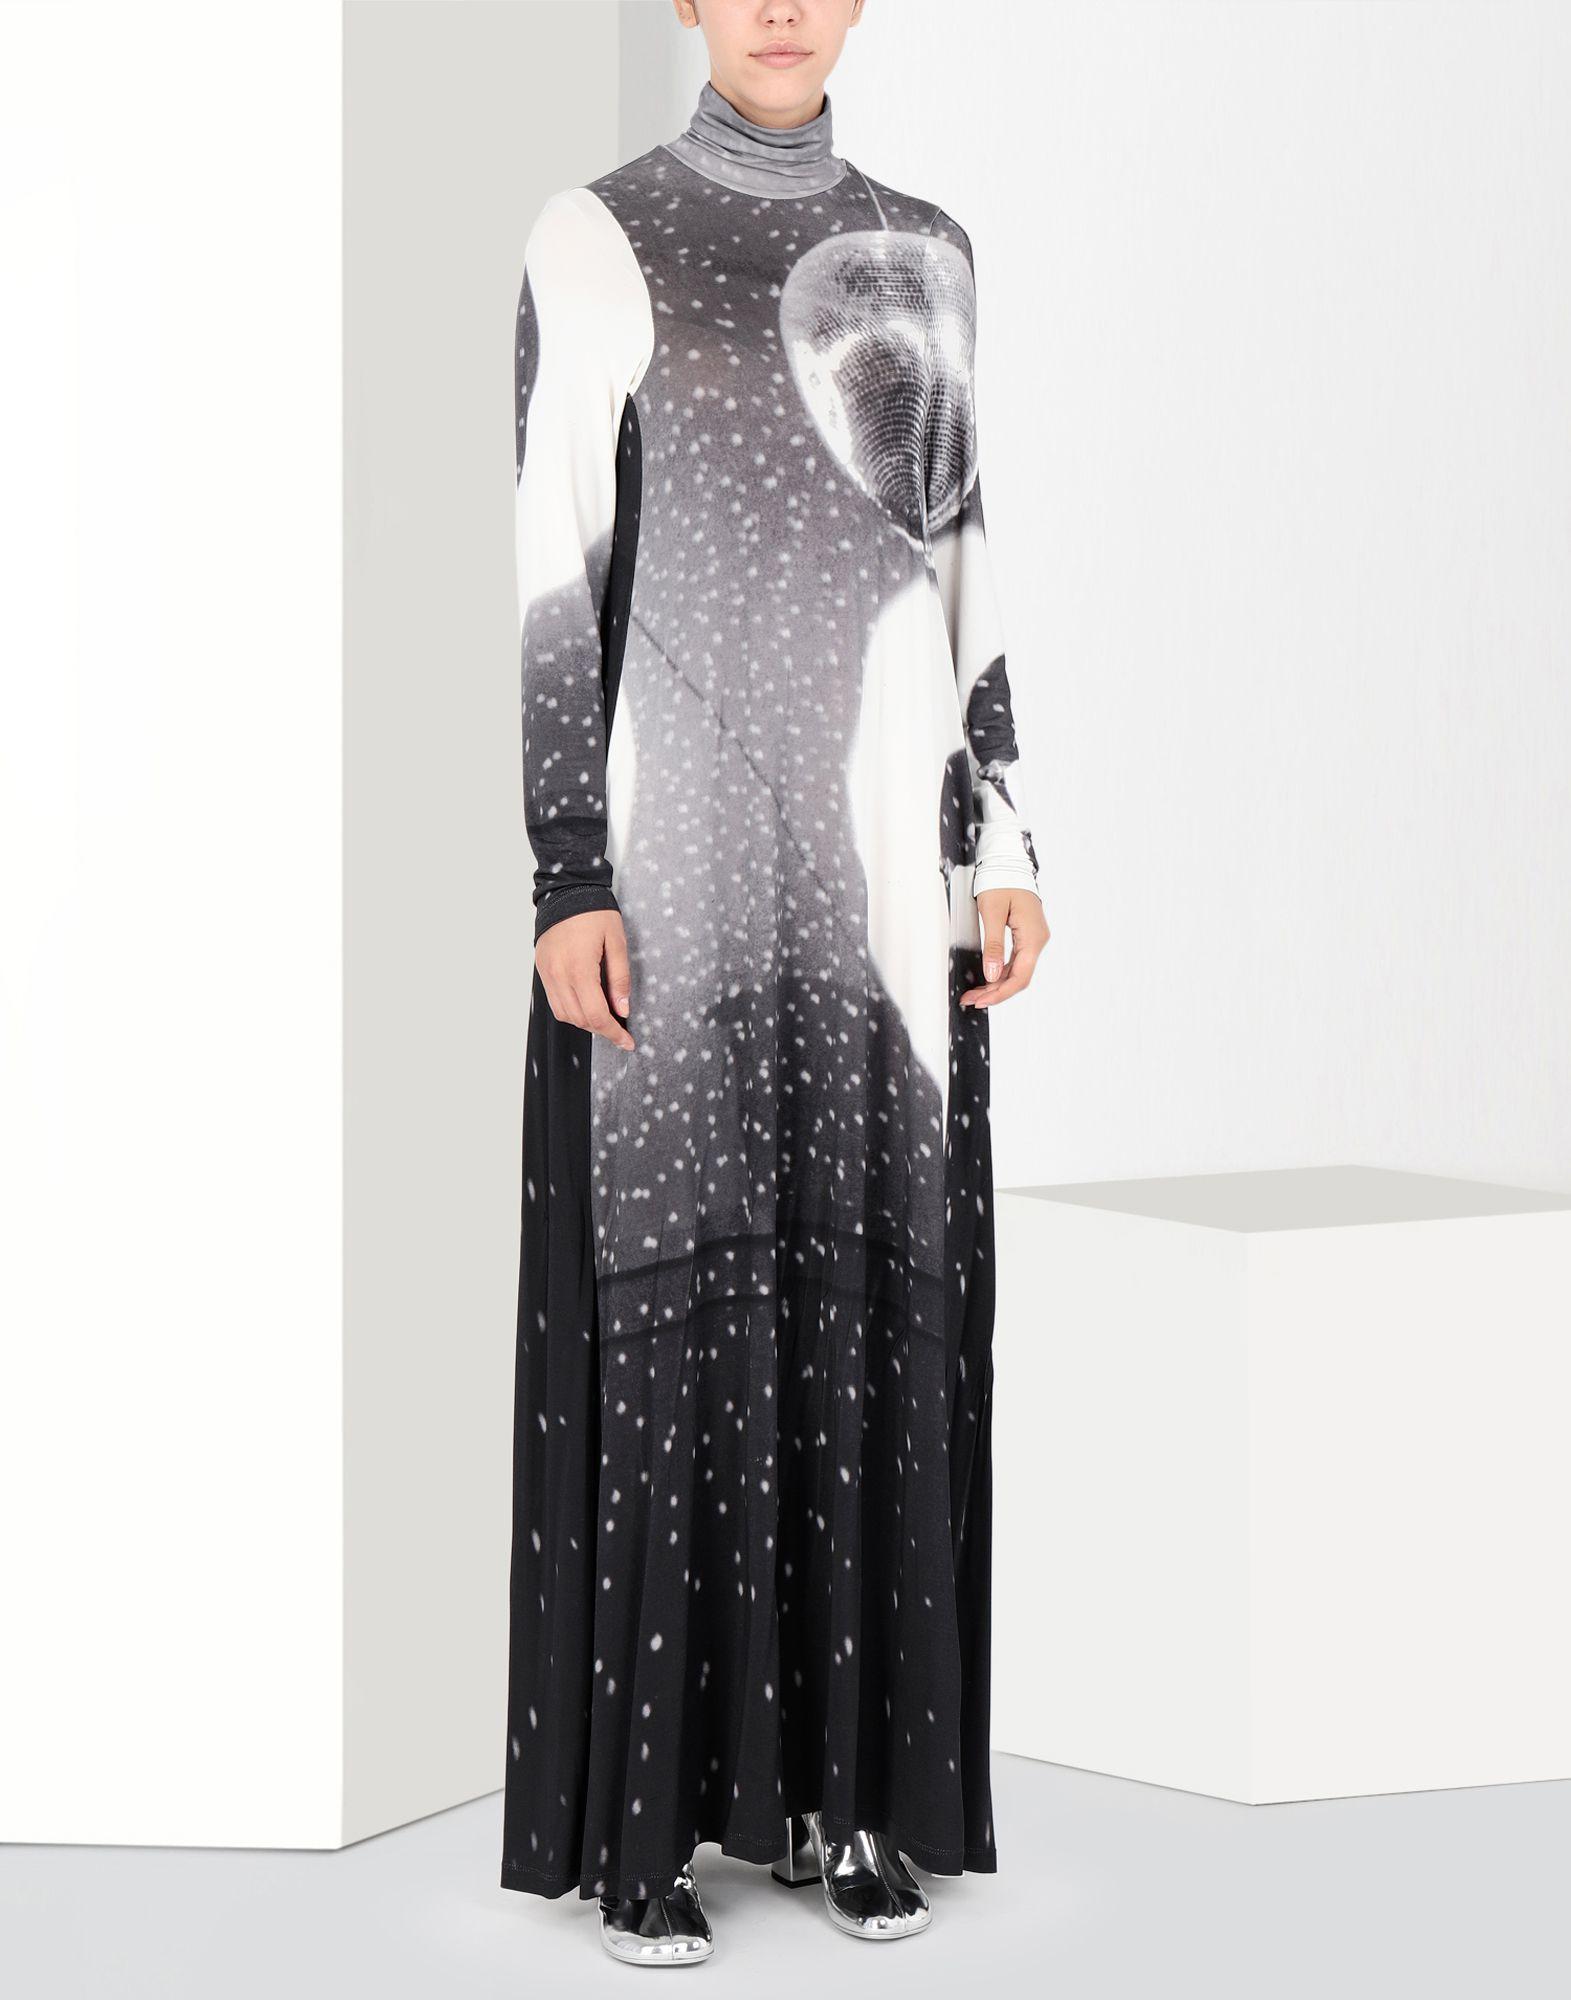 MM6 MAISON MARGIELA Reflex print long dress Long dress Woman f